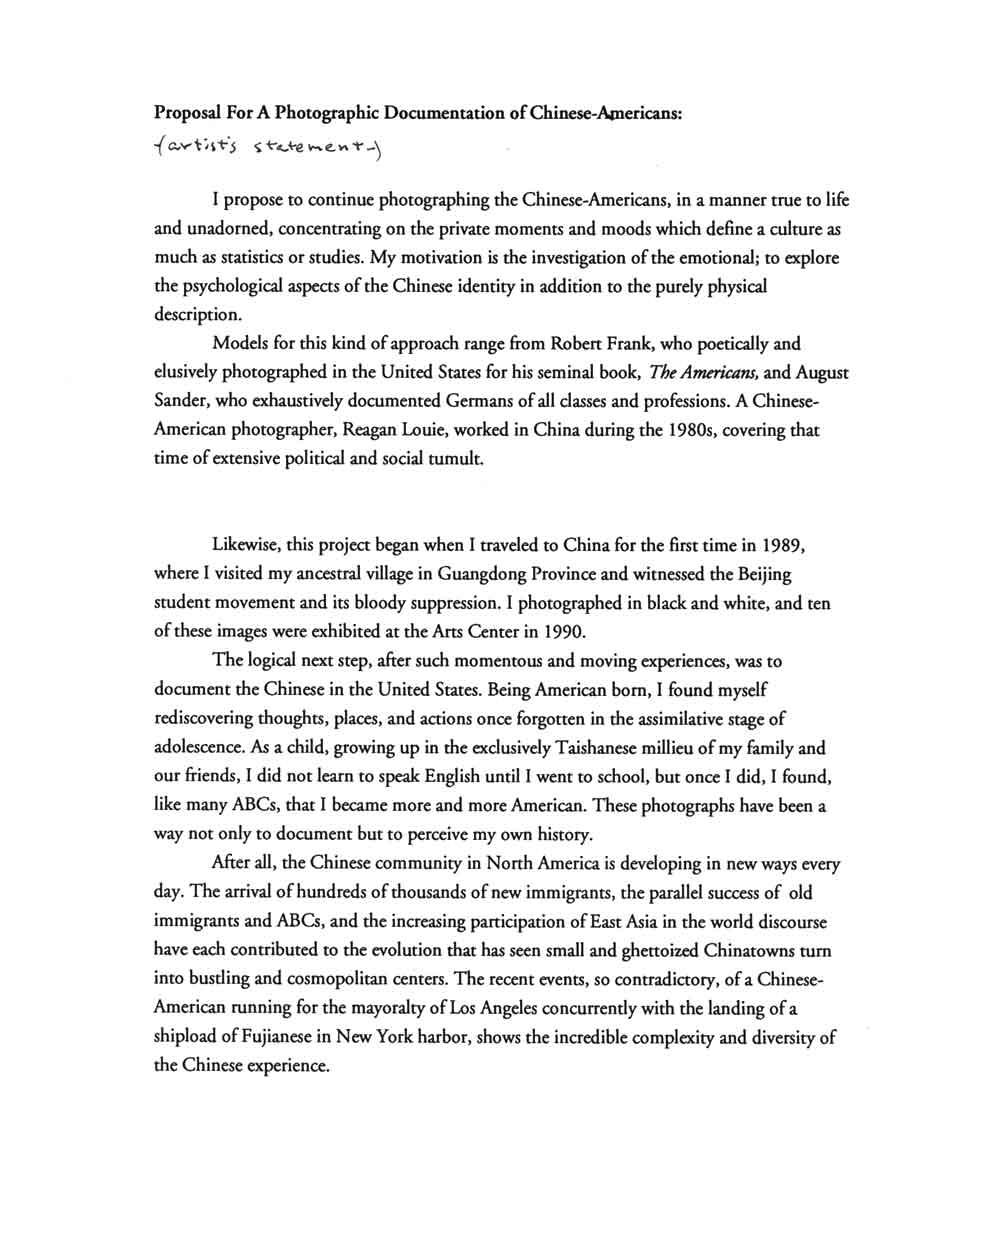 Alan Chin's Artist Proposal, pg 1